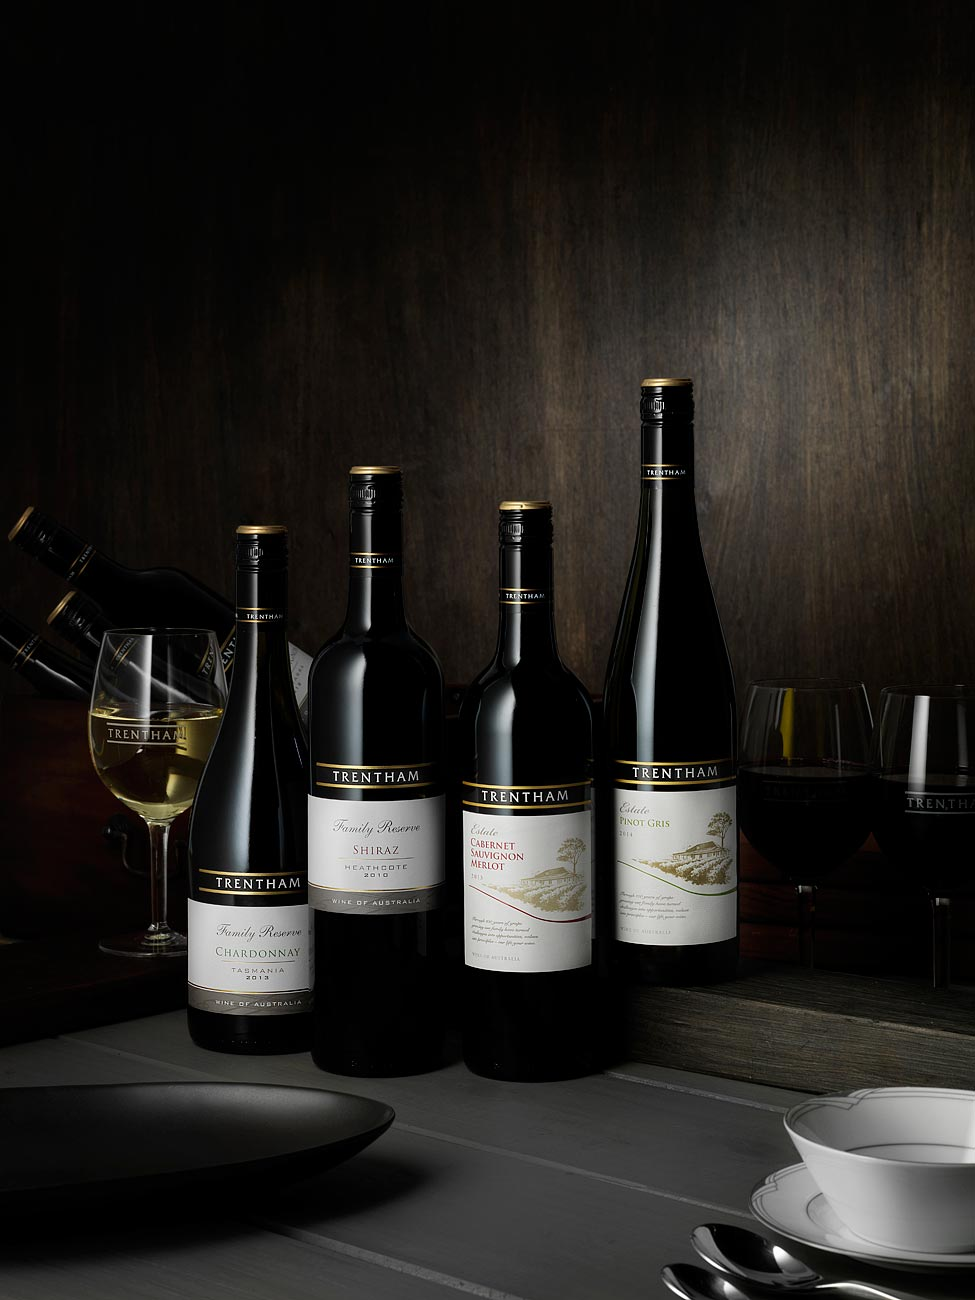 trentham_wines_1.jpg